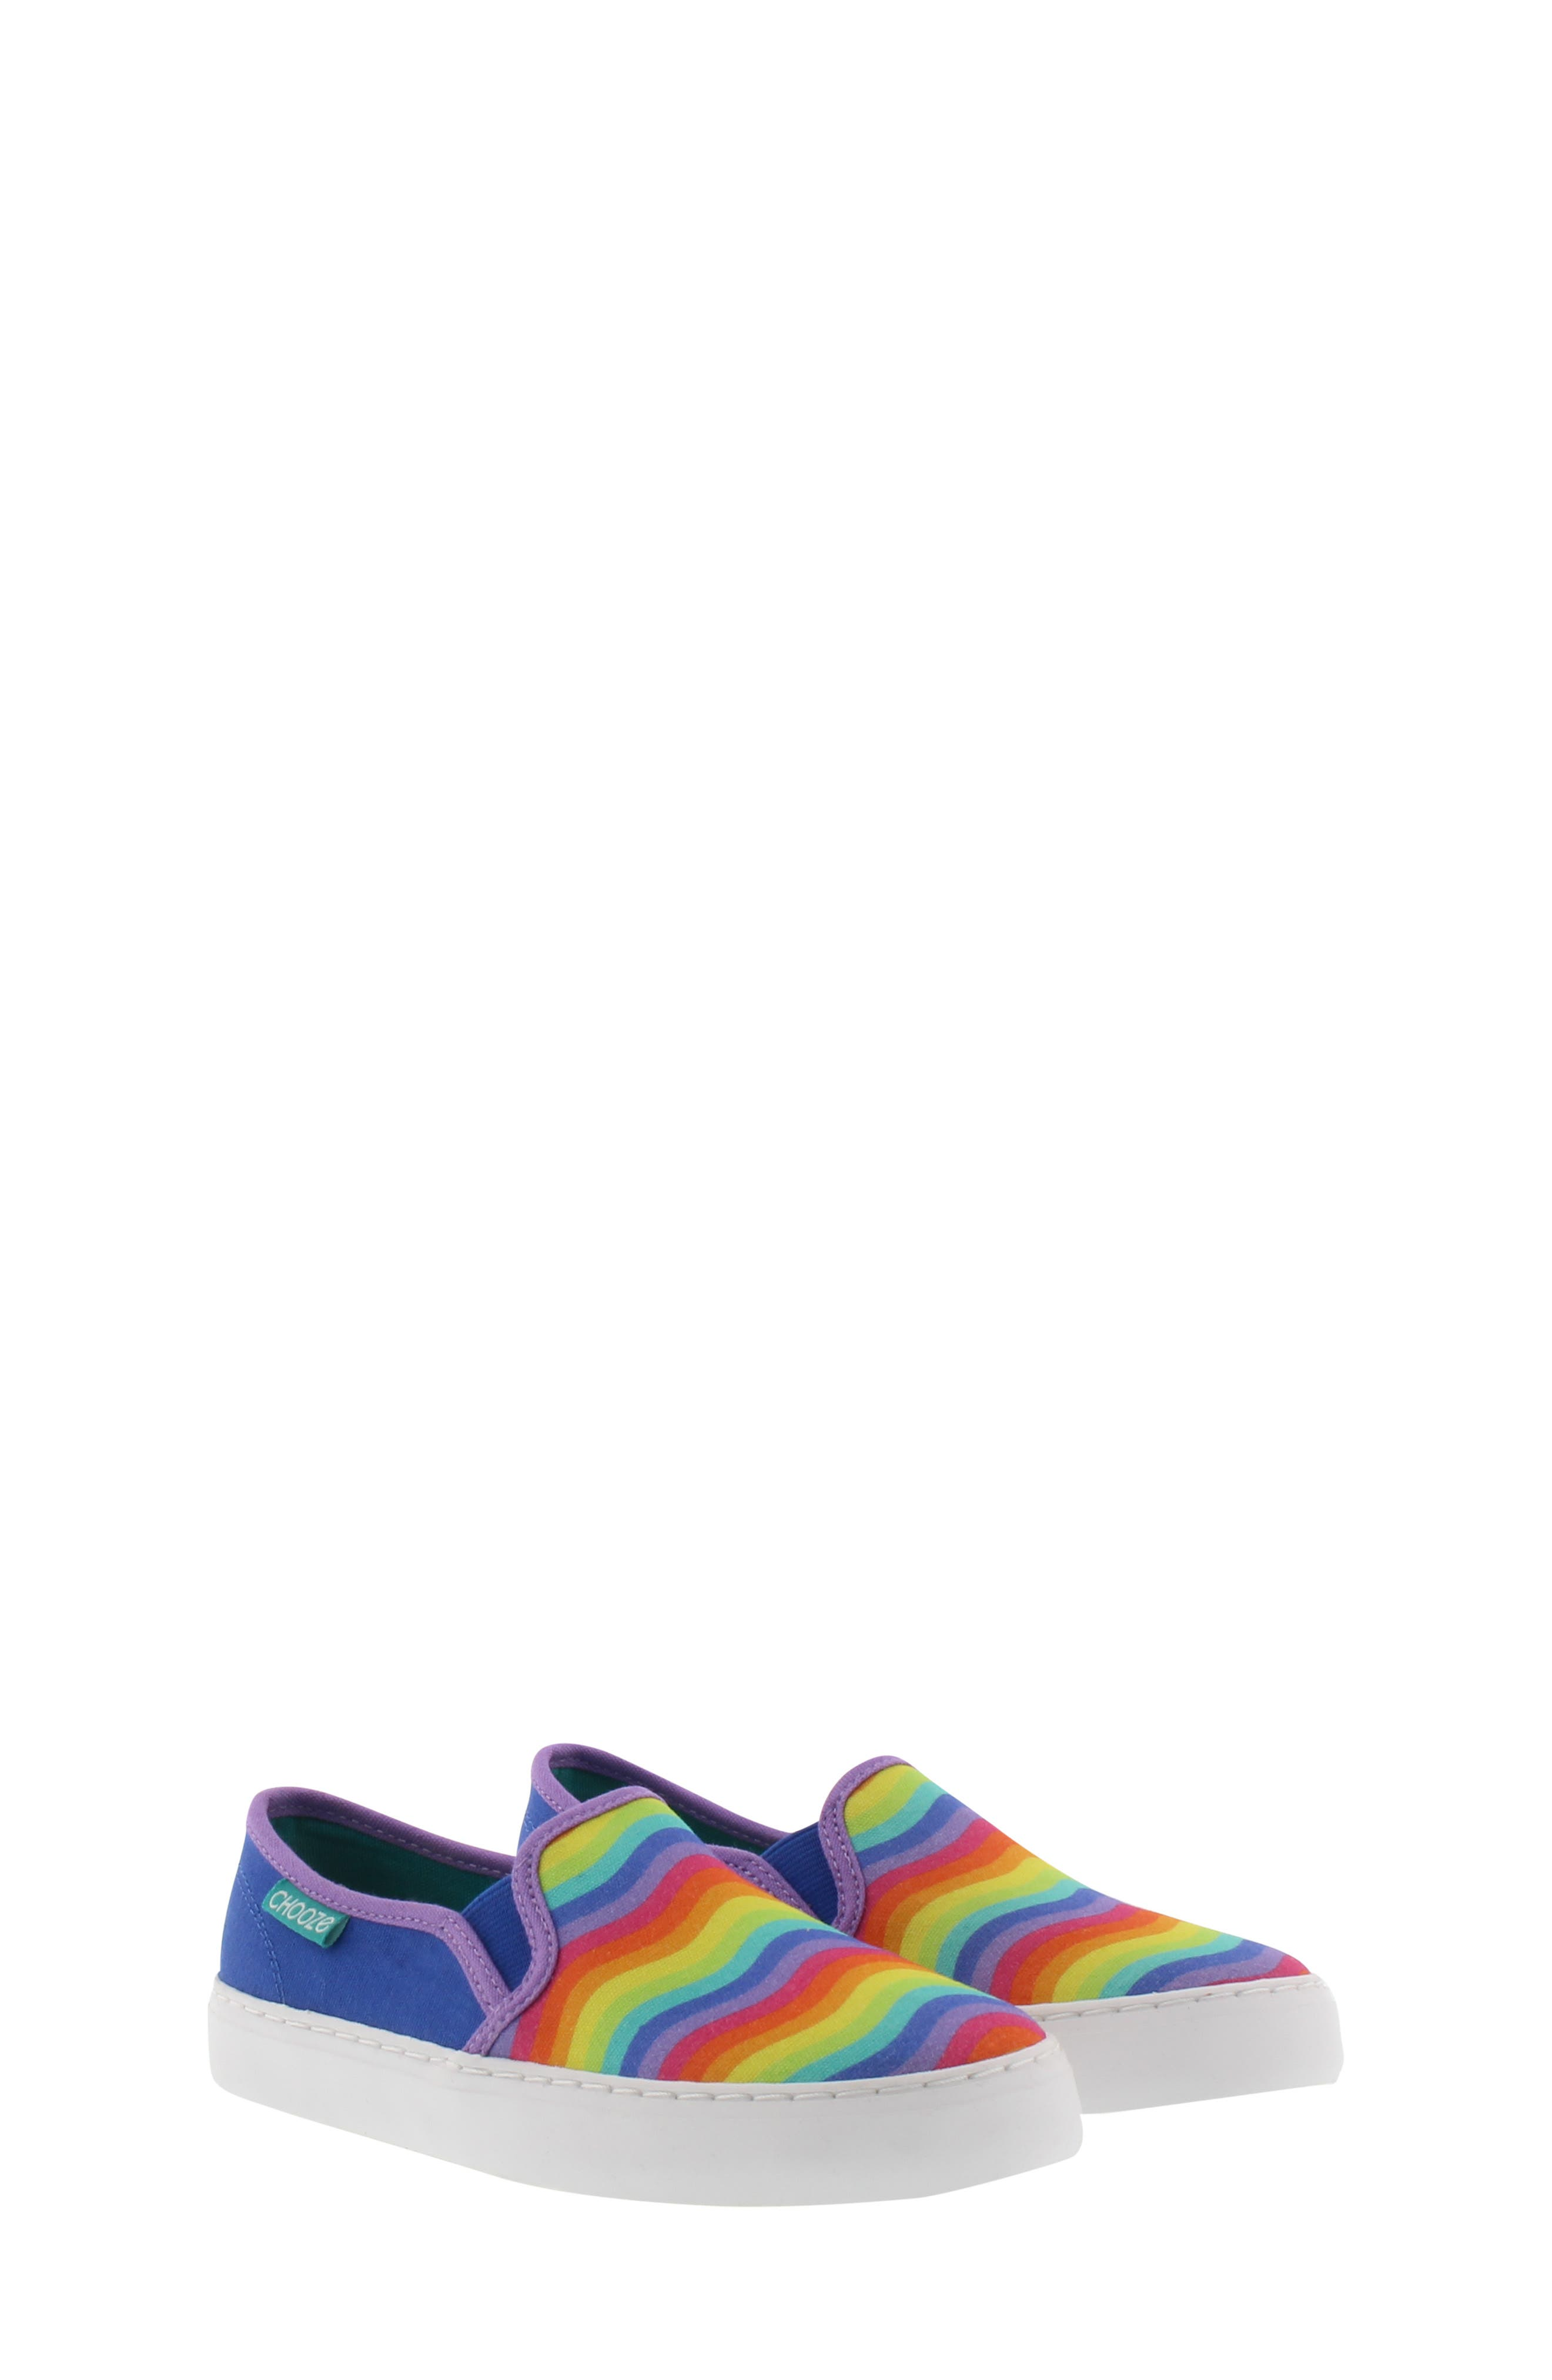 Motion Slip-On Sneaker,                             Main thumbnail 1, color,                             BLUE MULTI